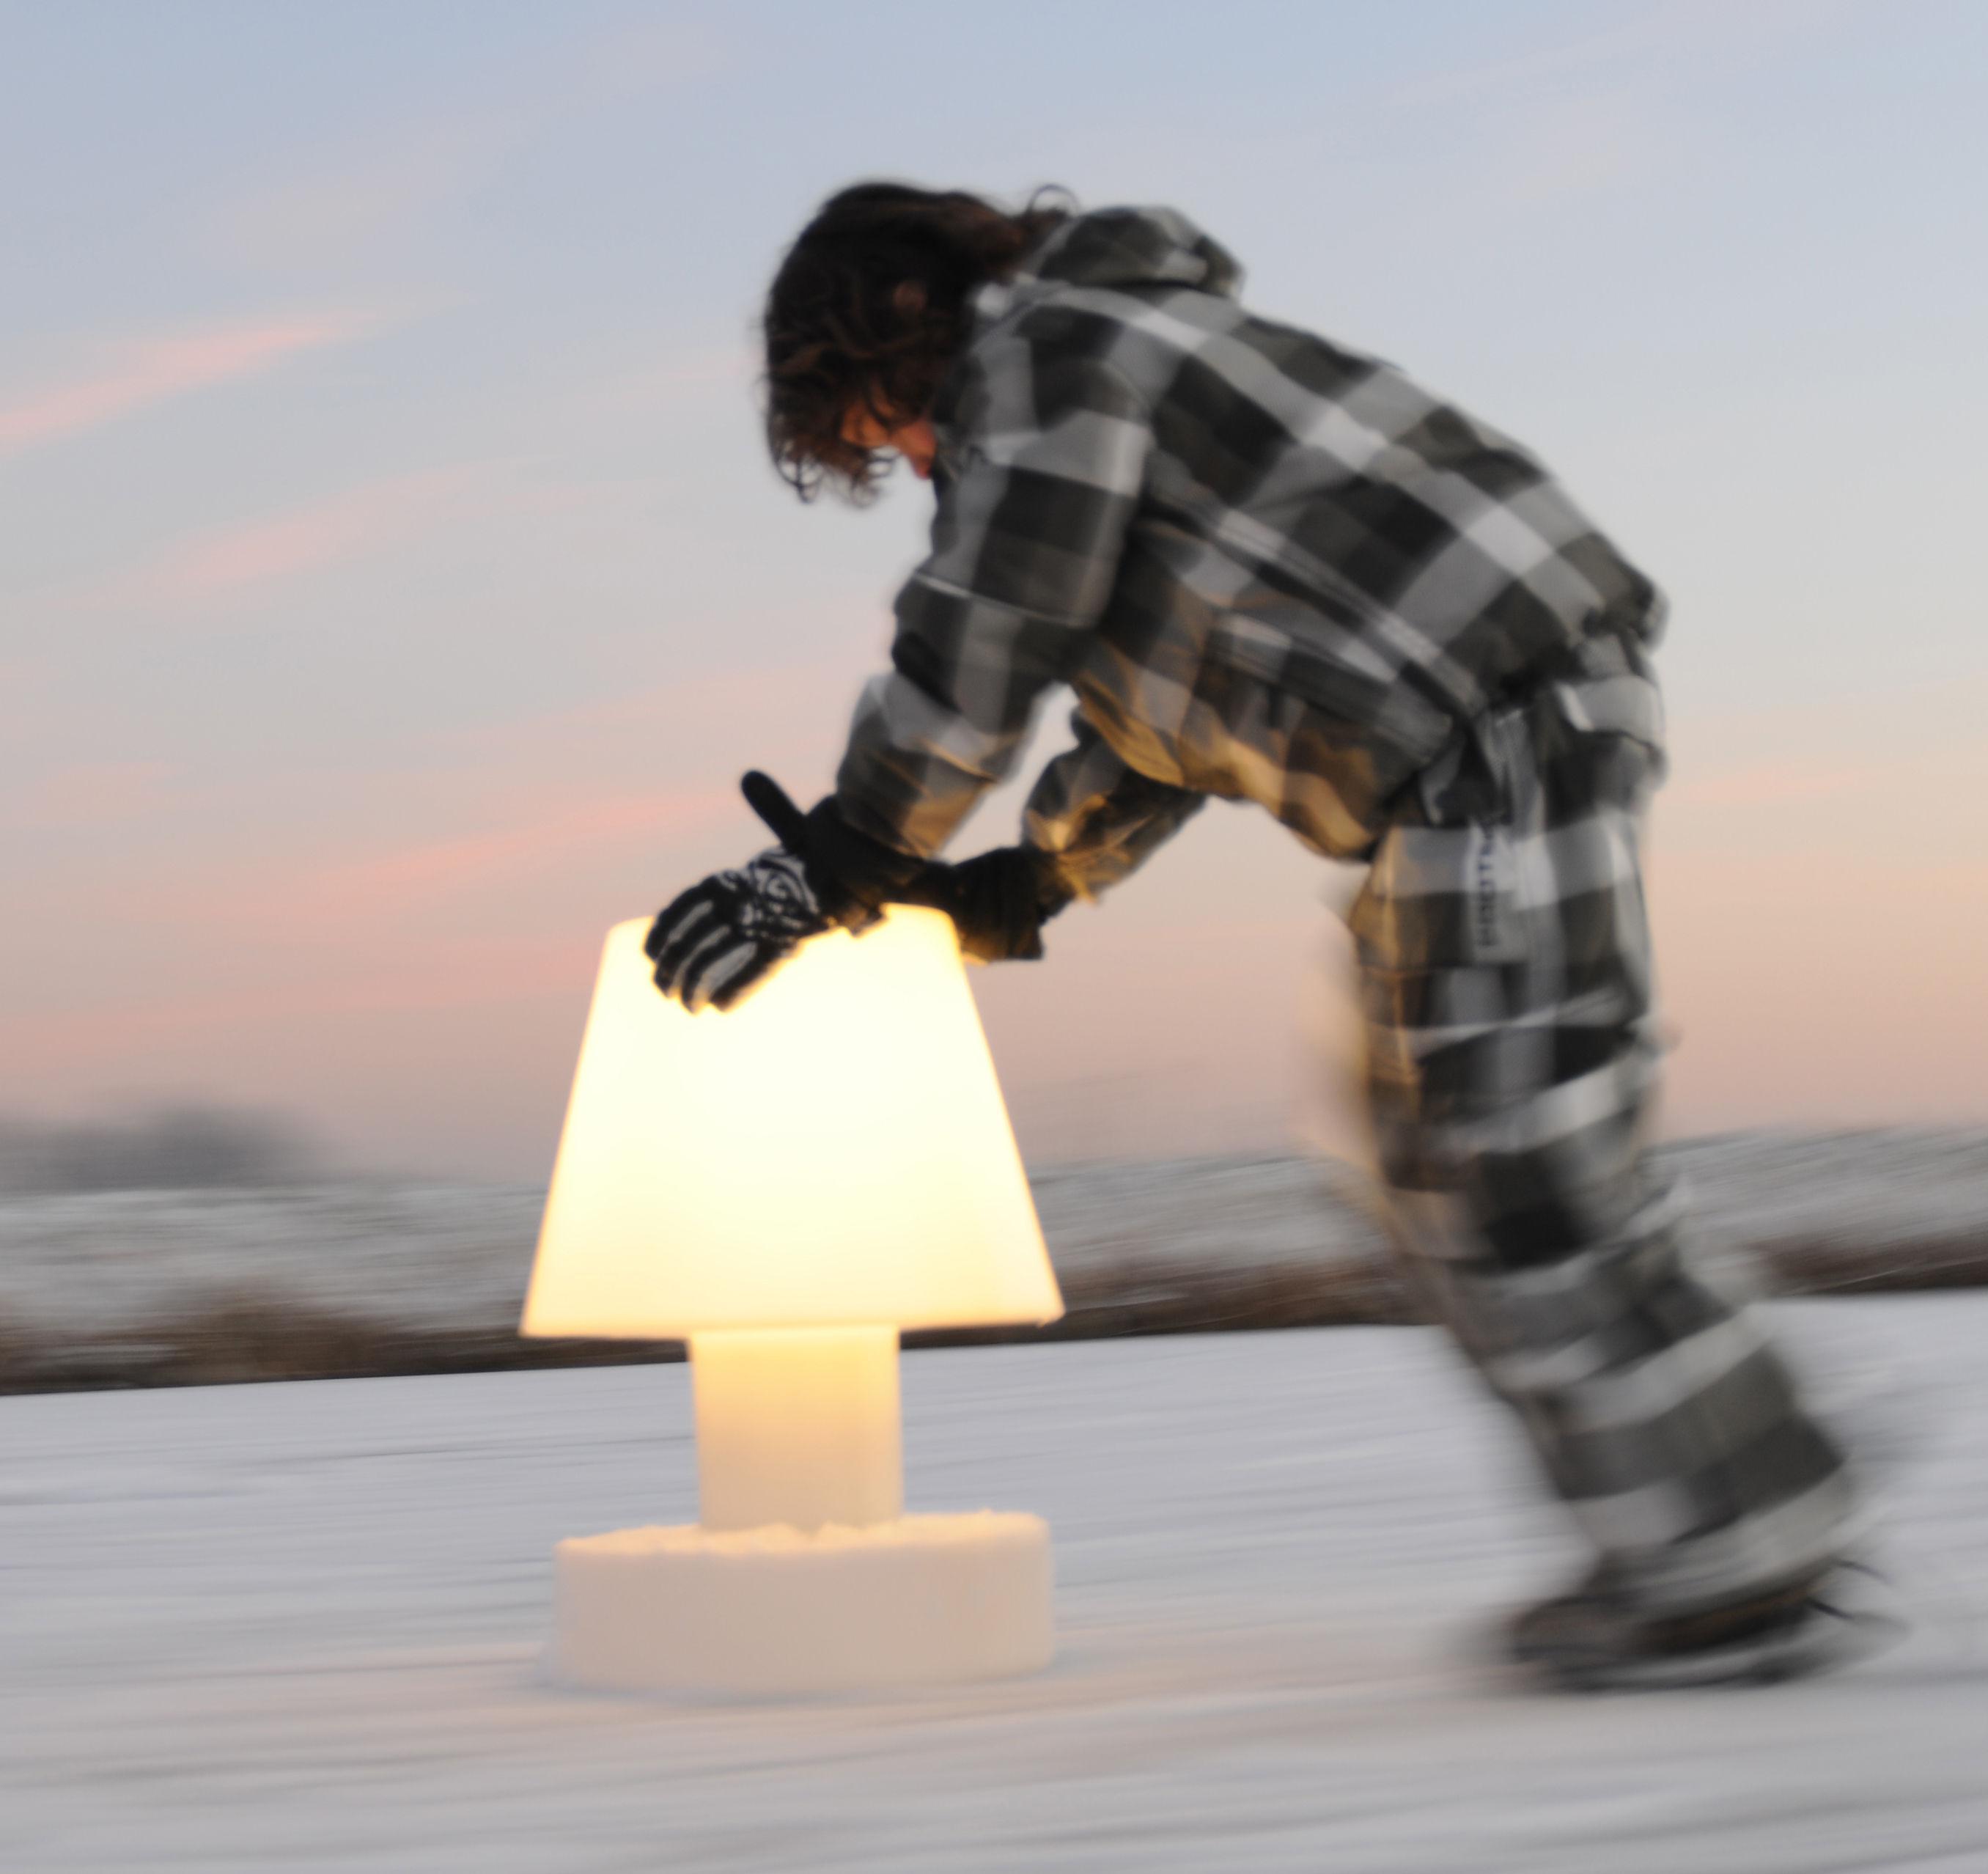 Scopri Lampada senza fili -Portatile senza filo ricaricabile - h 56 cm, Viola - H 56 cm di Bloom ...